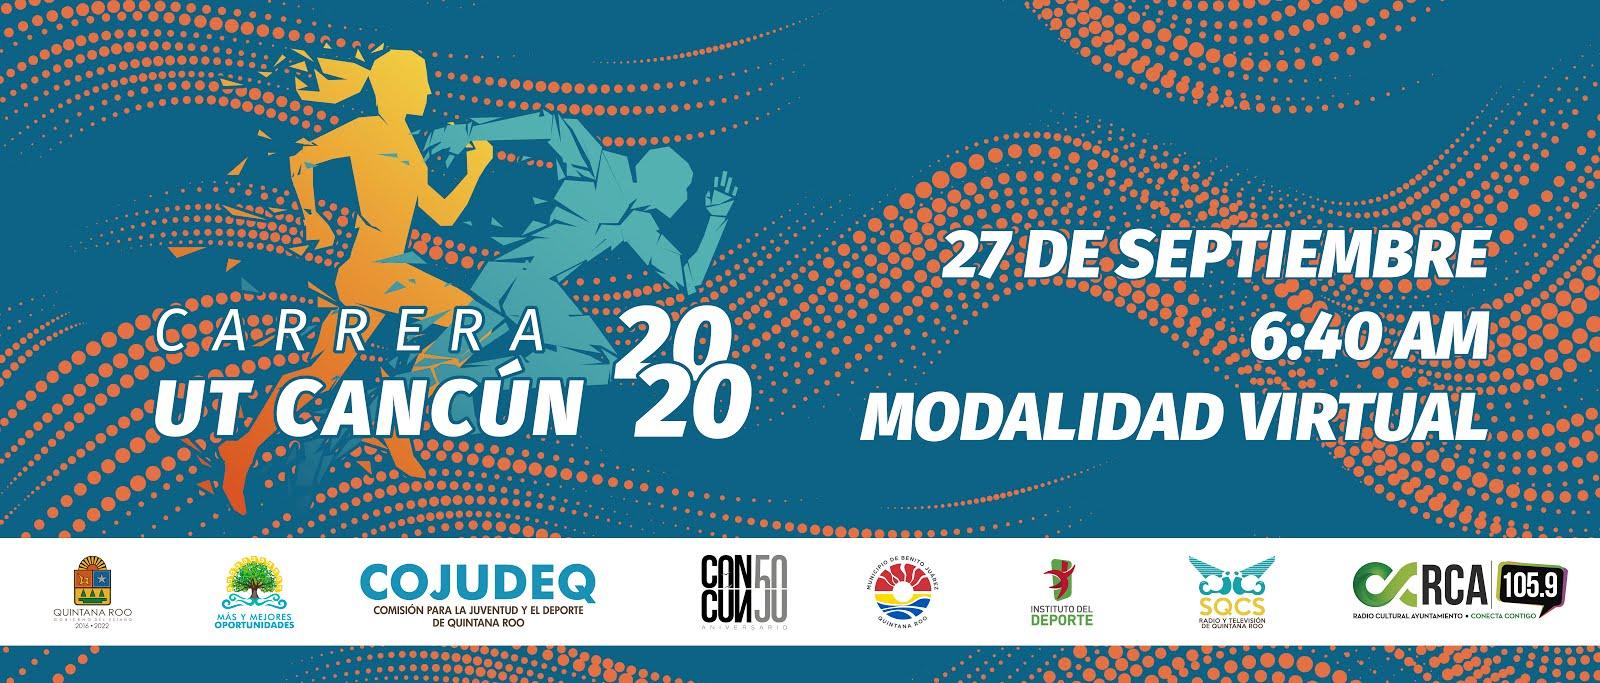 Carrera Ut Cancún 2020